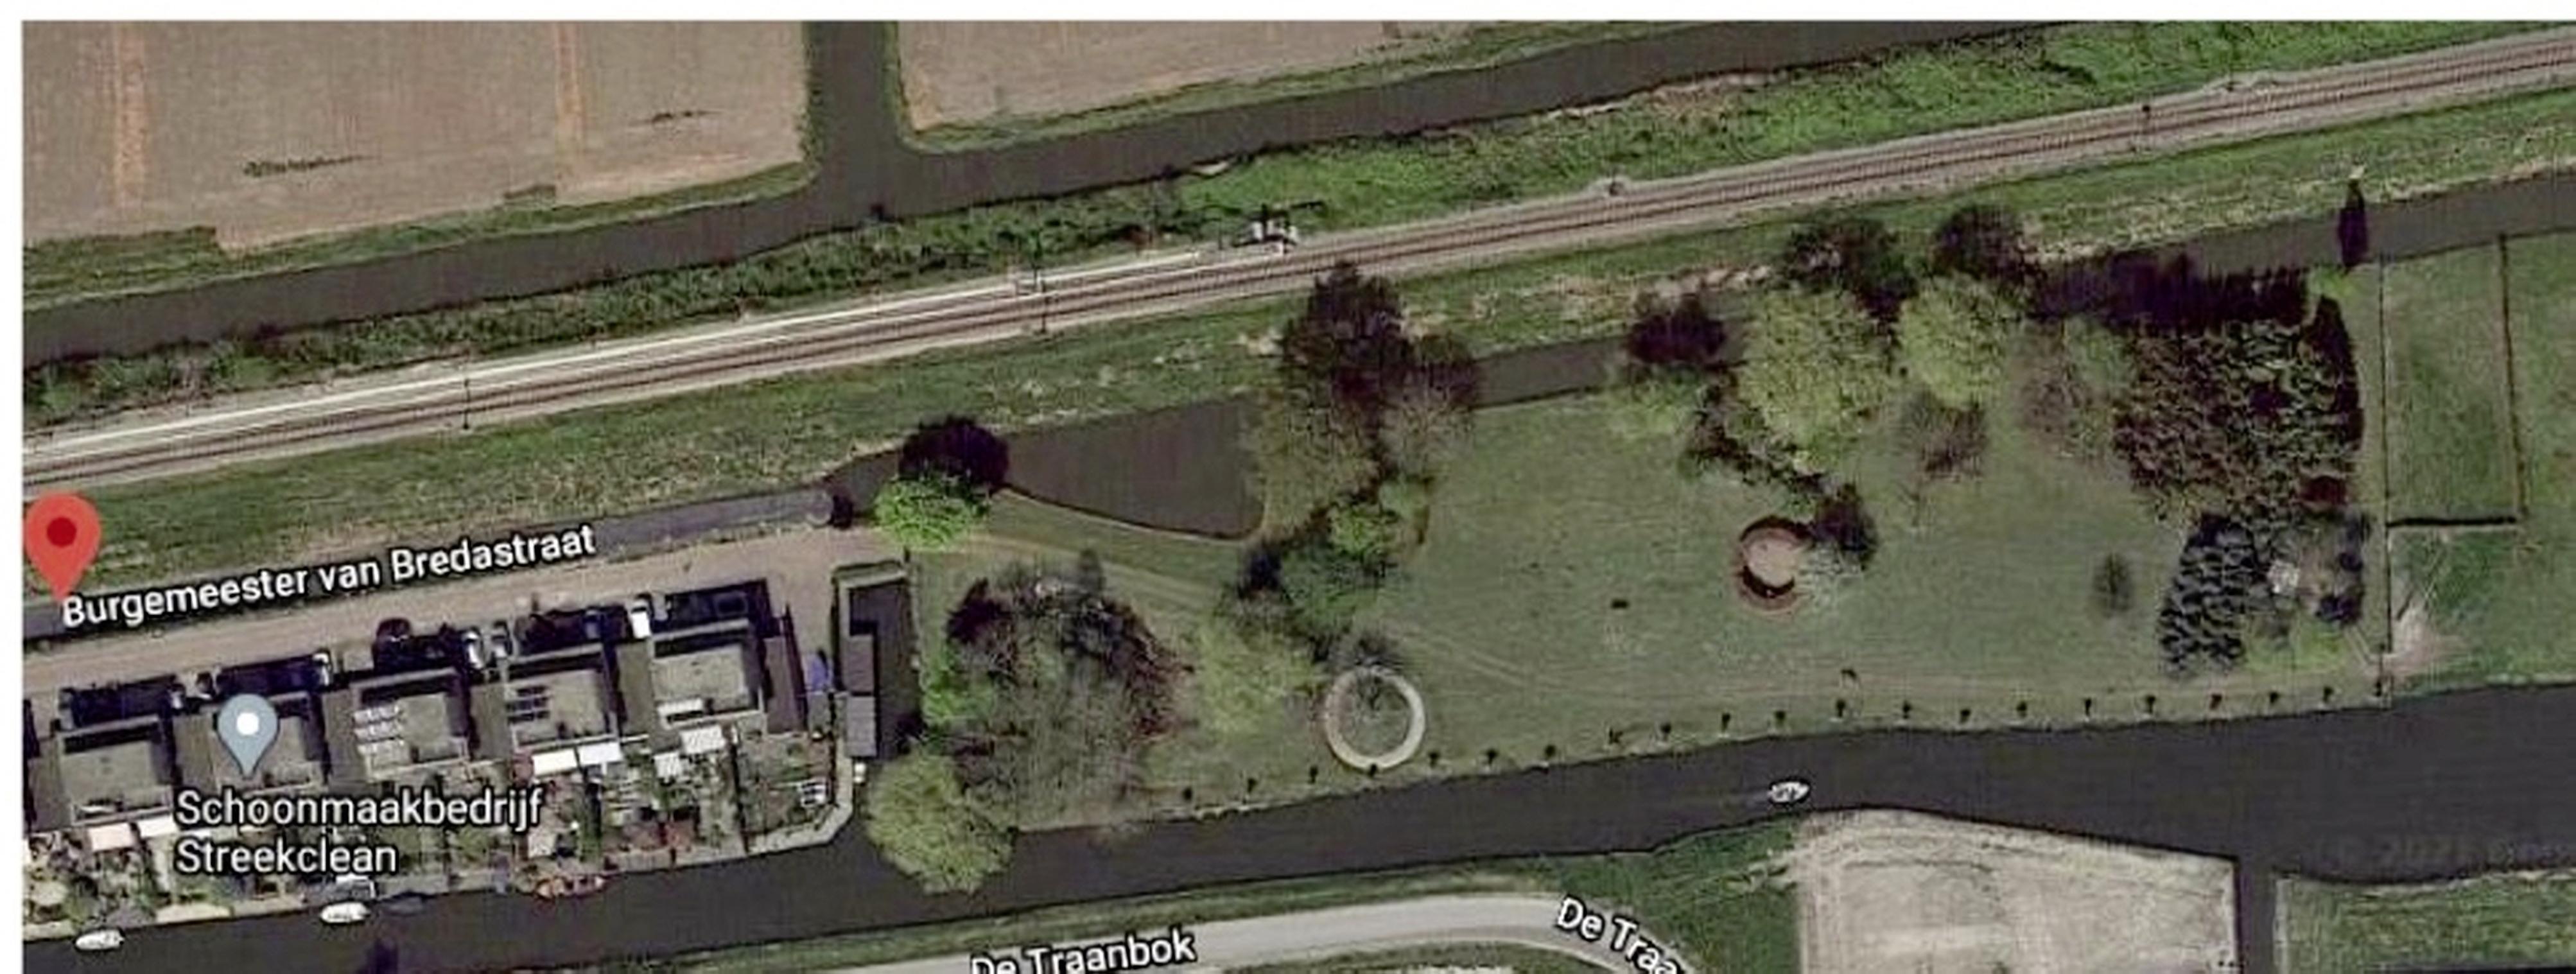 'Tiny houses op vervuilde bodem?' Plan ecologisch wonen volgens VVD op oude bolk